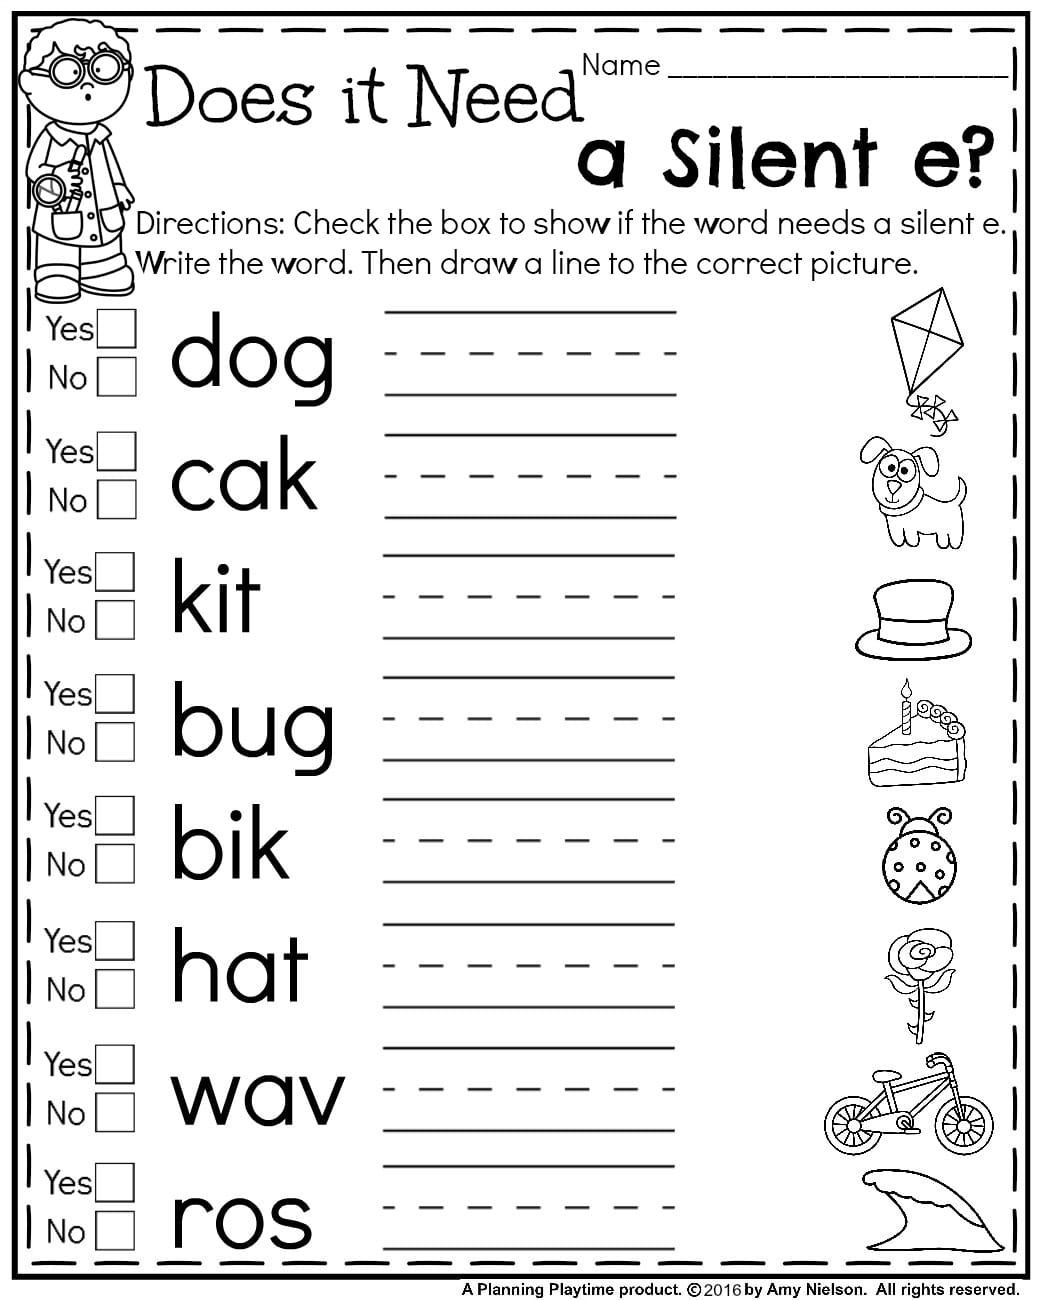 medium resolution of https://cute766.info/first-grade-silent-e-worksheets-for-summer-1st-grade-worksheets-2nd-grade-worksheets-first/